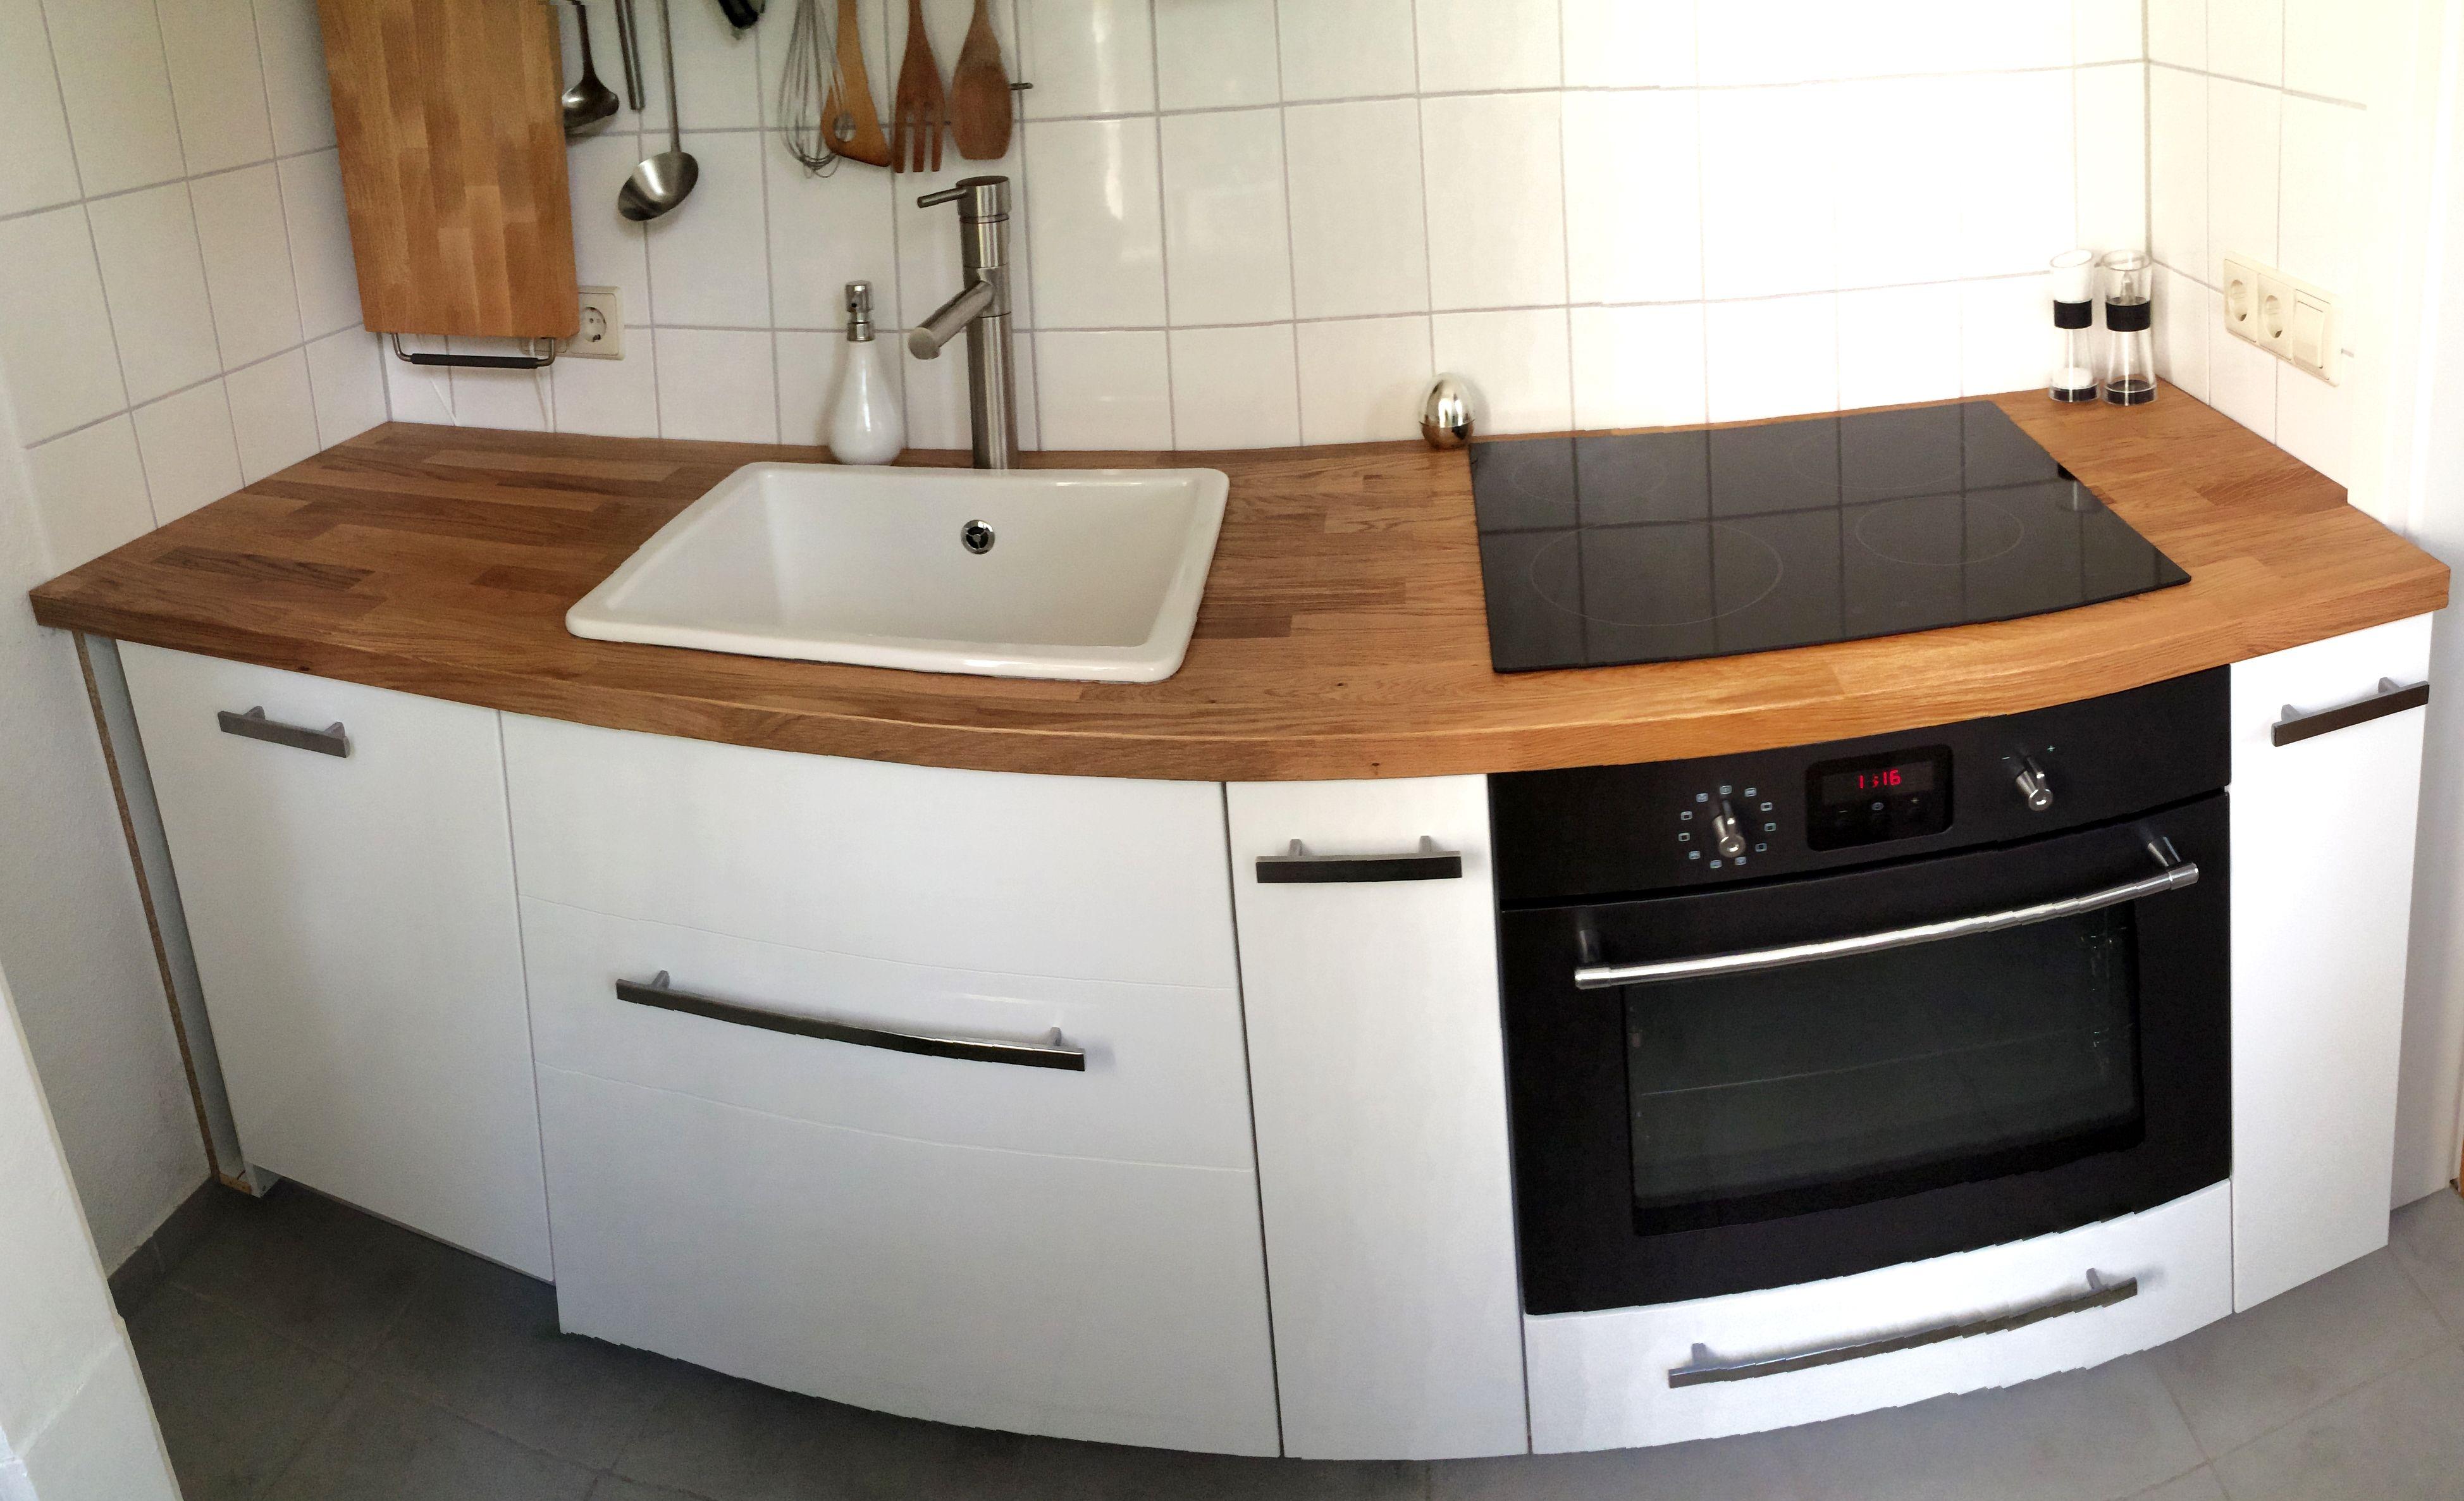 selbstversuch unsere erste ikea k che ikea k chen pinterest ikea k che ikea und ikea. Black Bedroom Furniture Sets. Home Design Ideas